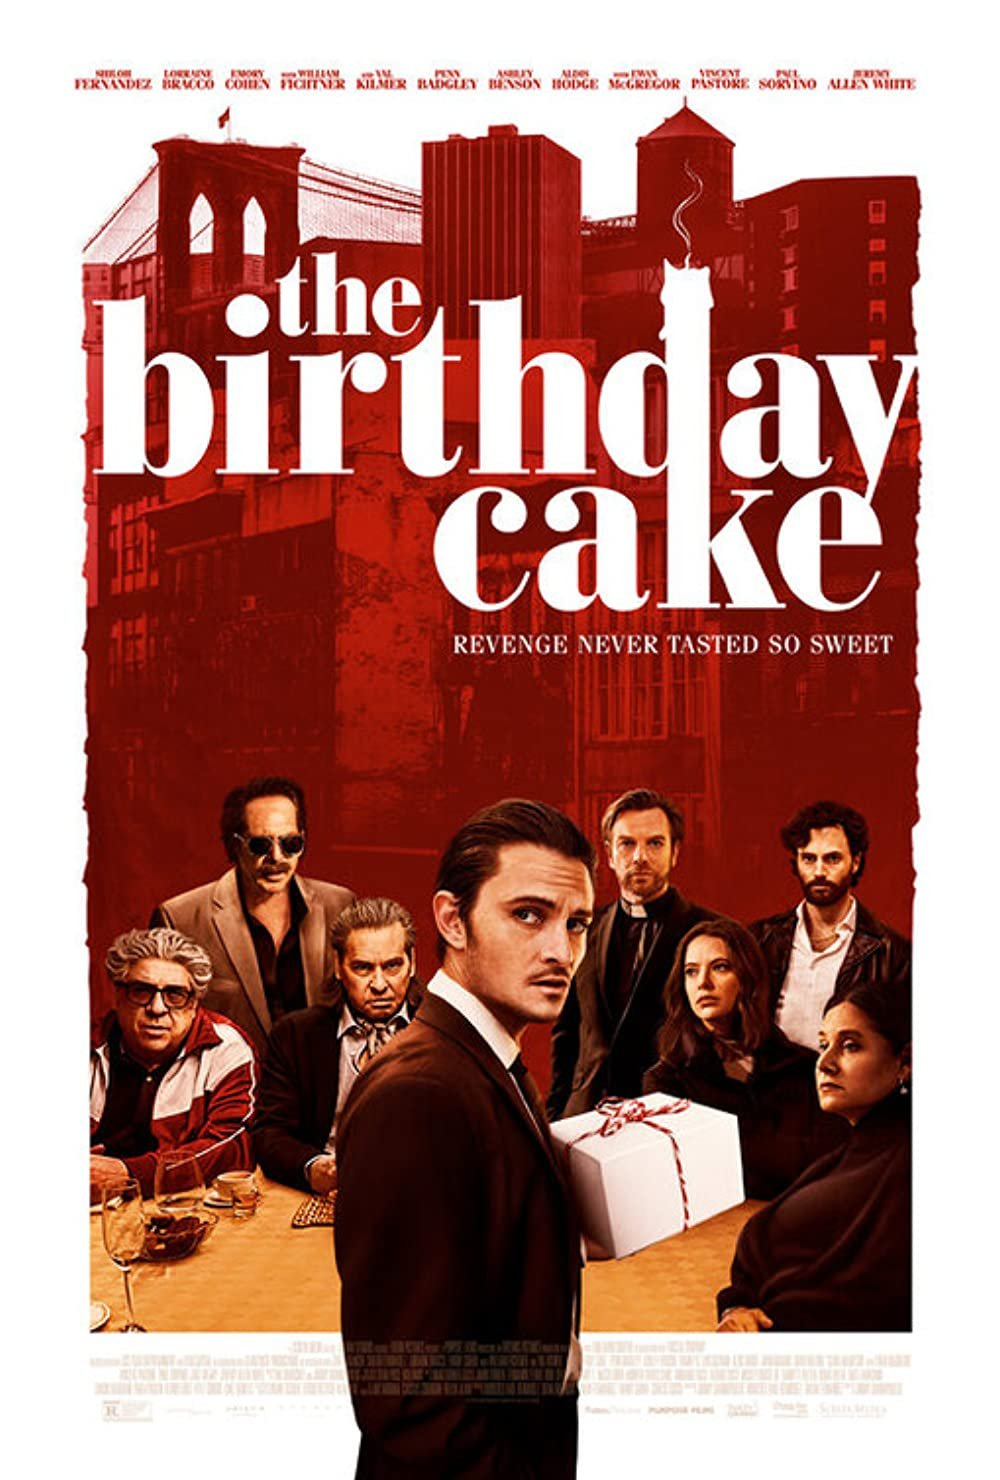 The Birthday Cake poster image